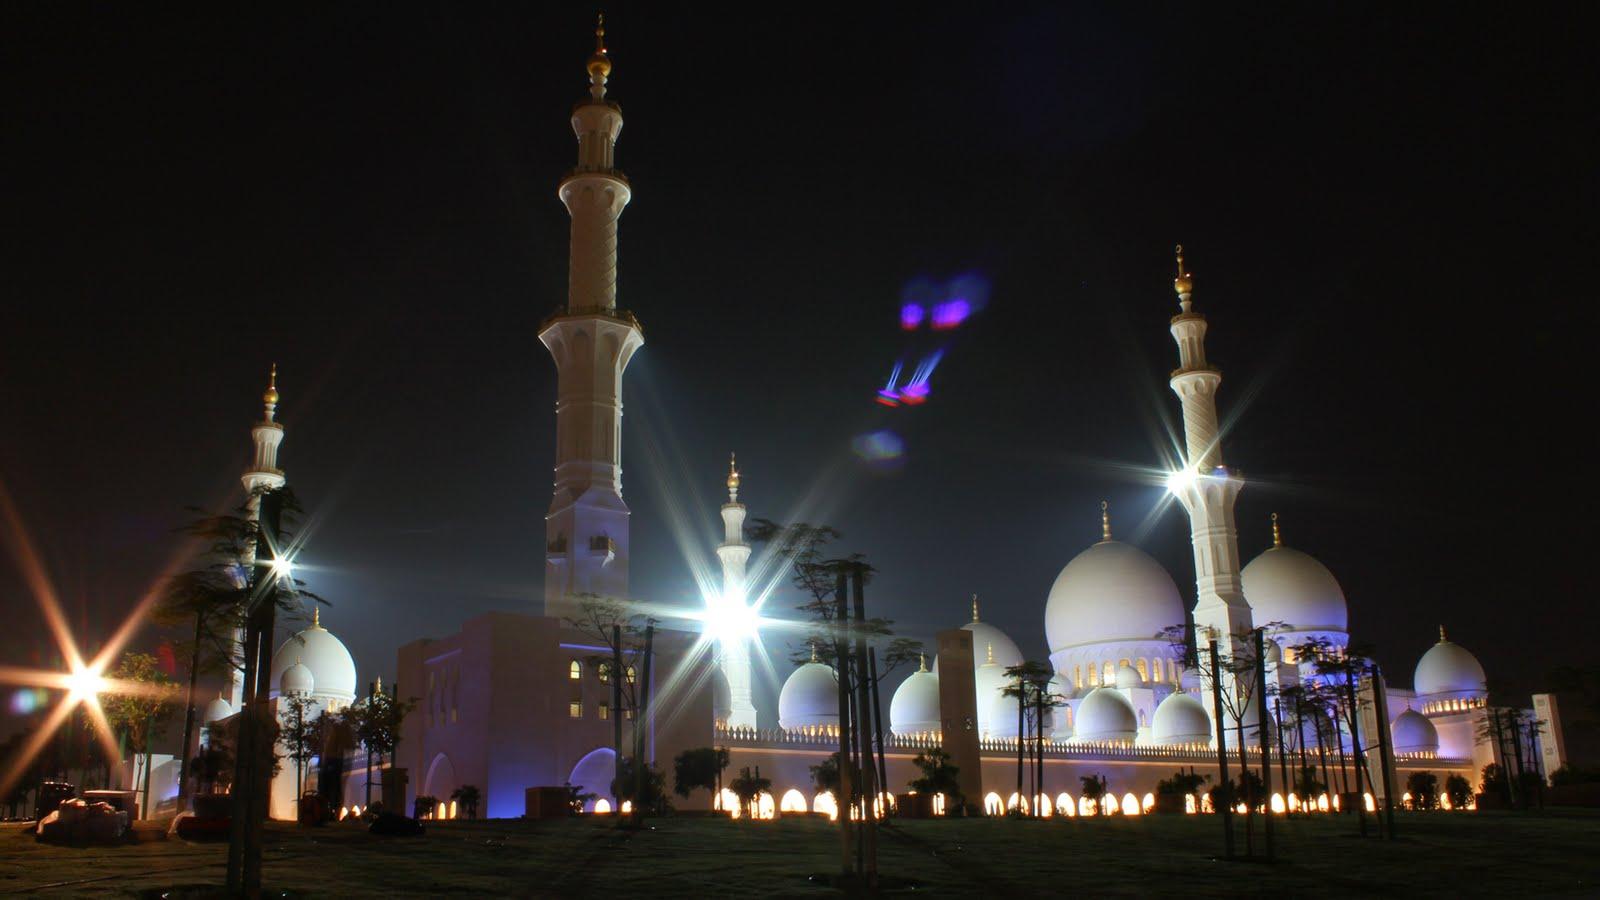 2011-07-31-Mosque.jpg